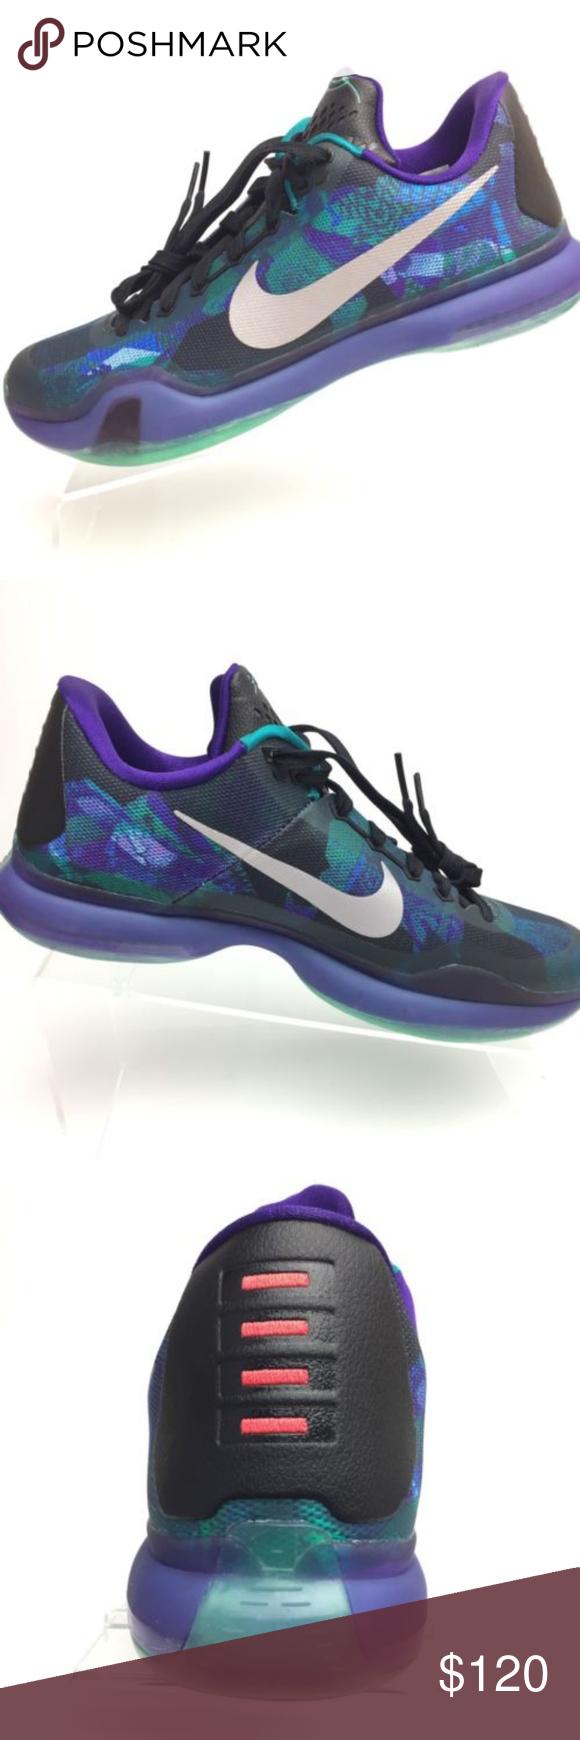 5c8004edfd9a Nike Kobe X Elite Low OVERCOME Emerald Glow Shoes Nike Kobe X Elite Low  OVERCOME Emerald Glow Basketball Shoes Men s Size 8.5 US 705317-305 Brand  New ...